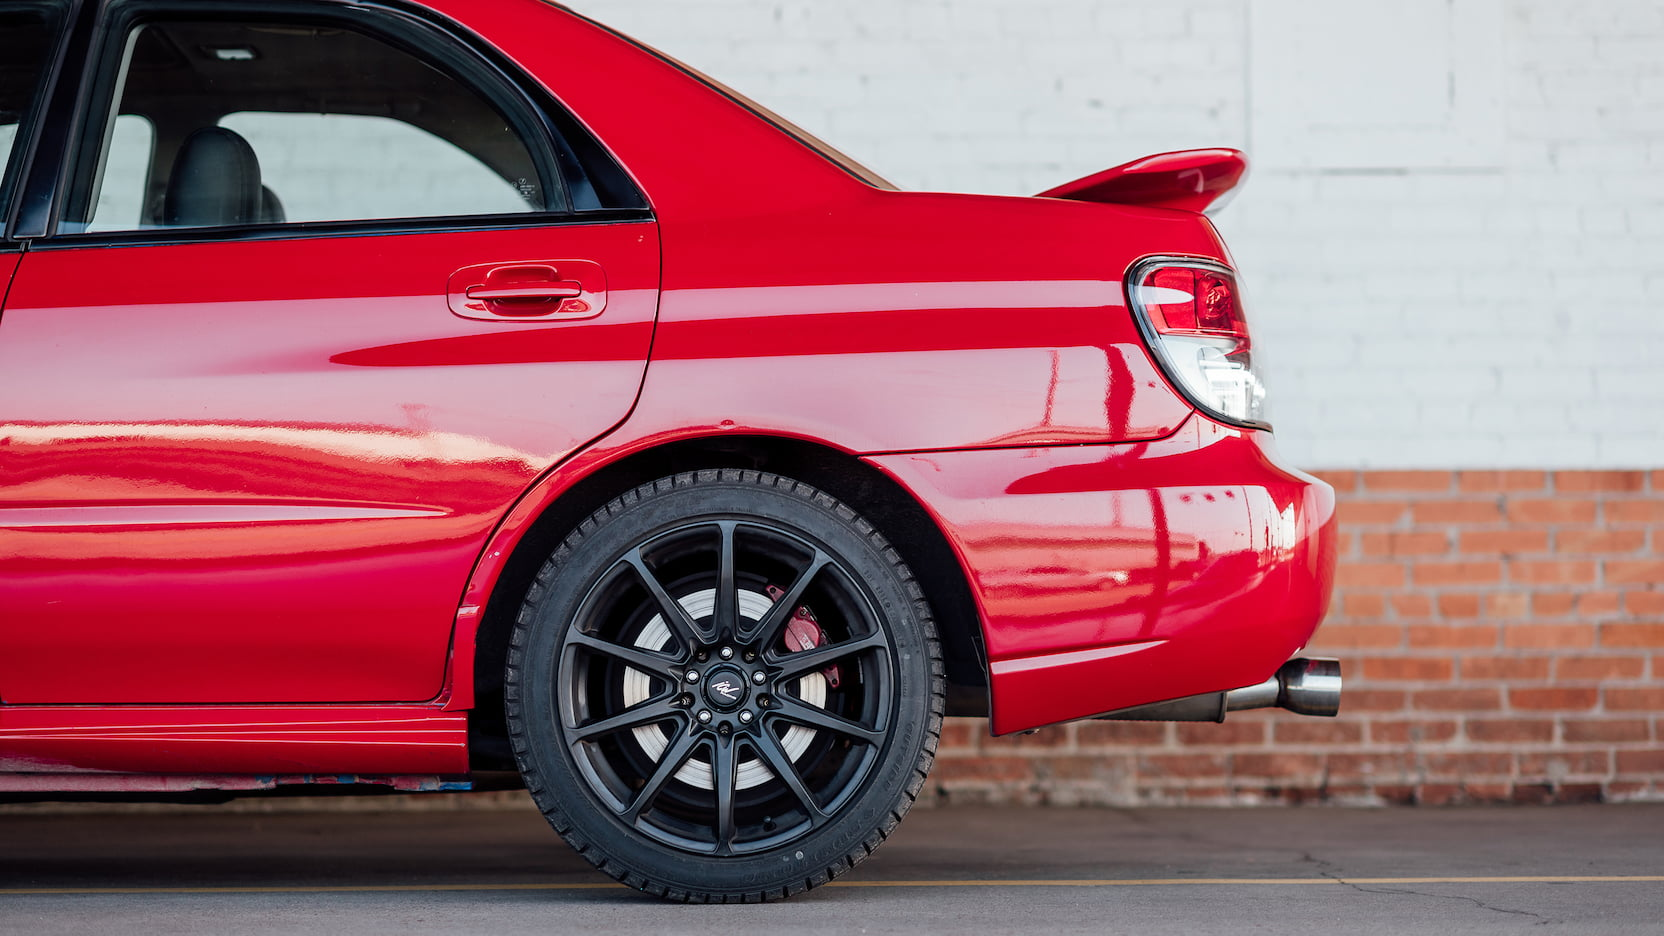 2006 Subaru WRX wheel detail